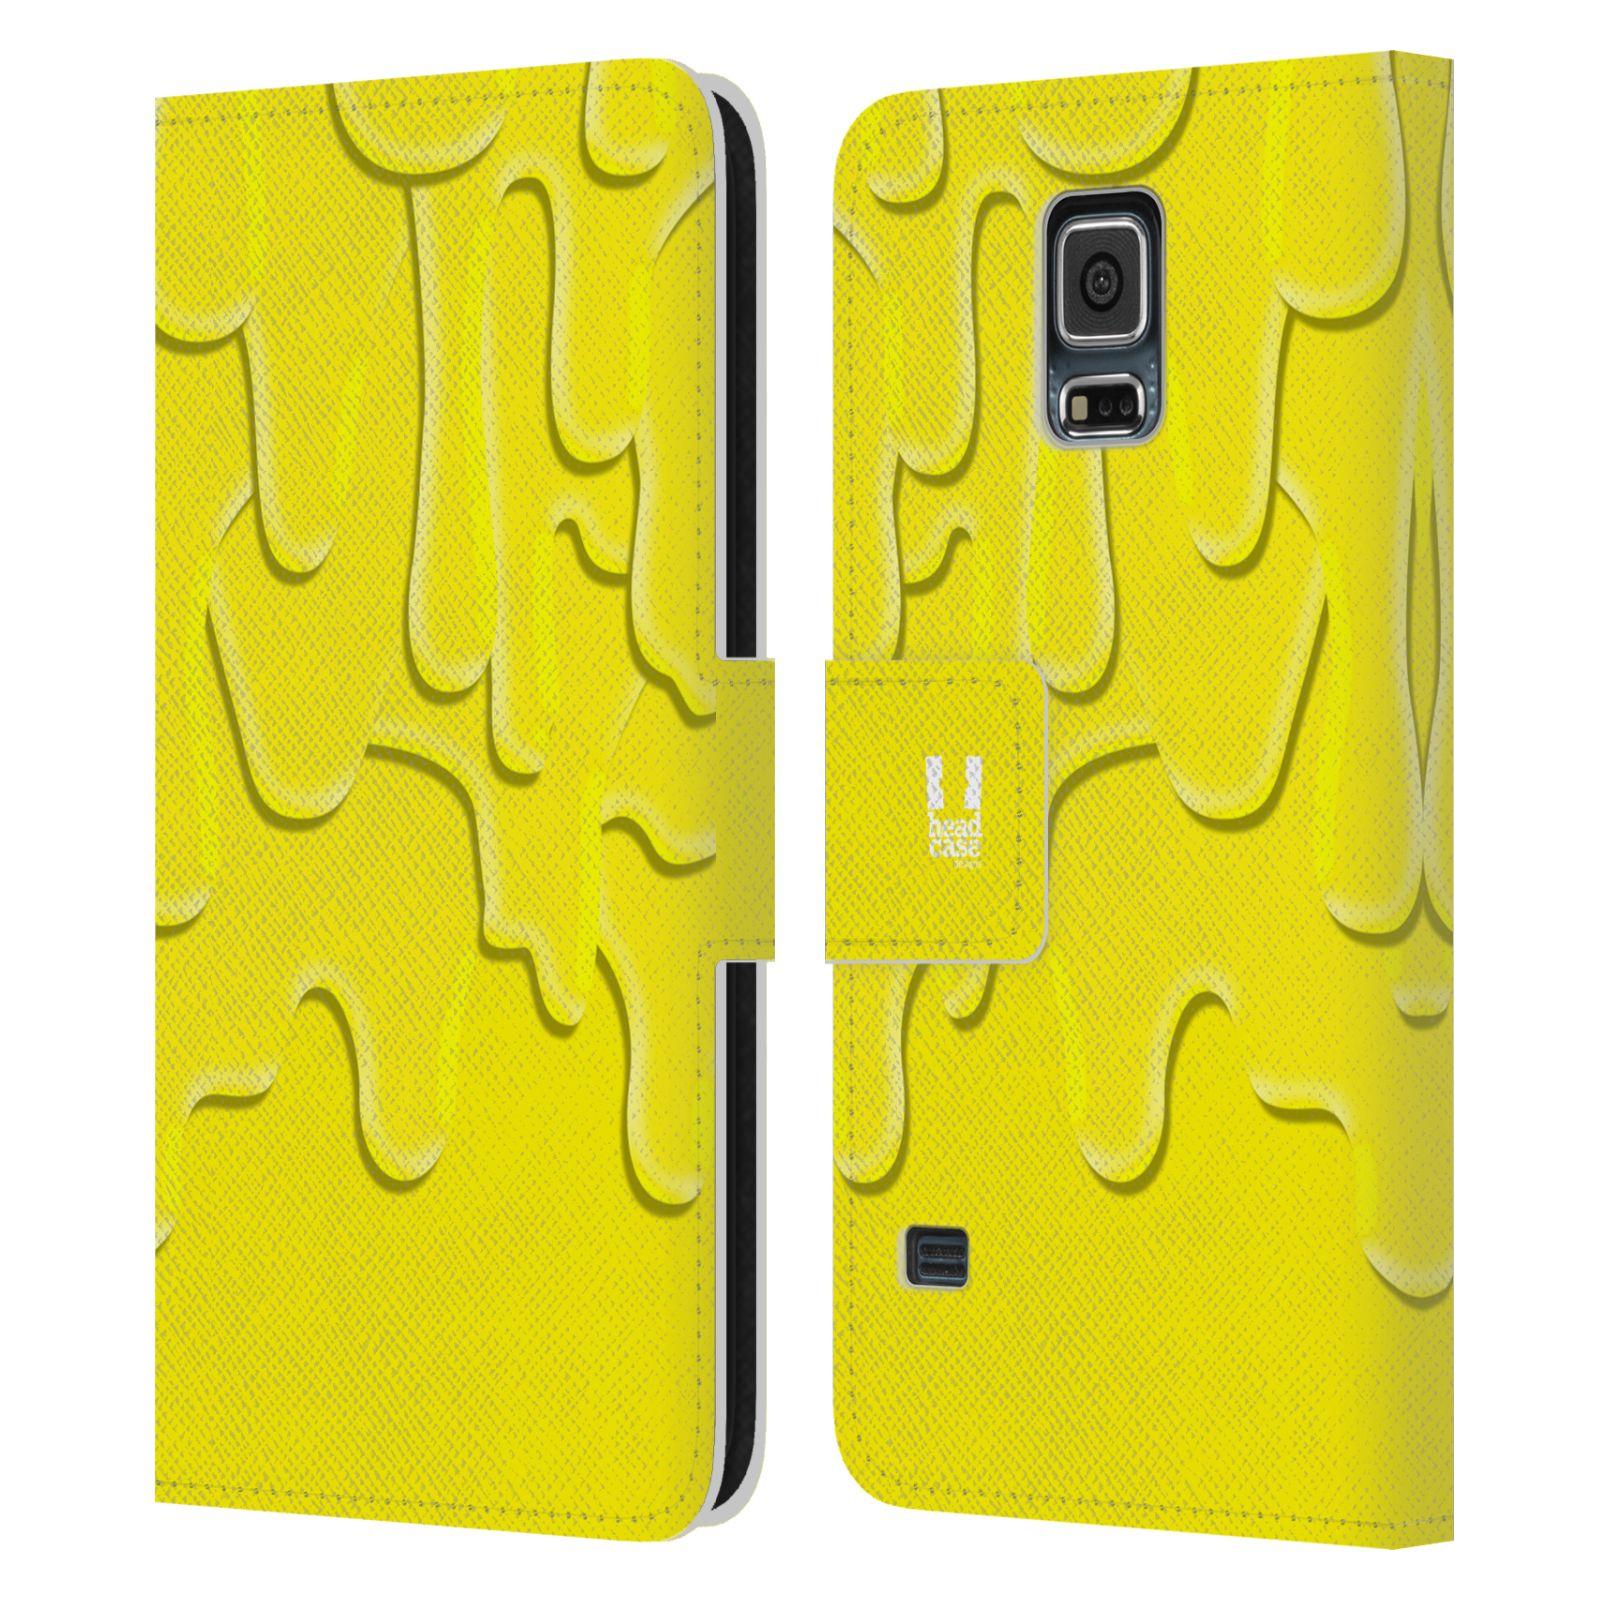 HEAD CASE Flipové pouzdro pro mobil Samsung Galaxy S5 / S5 NEO ZÁPLAVA BARVA žlutá